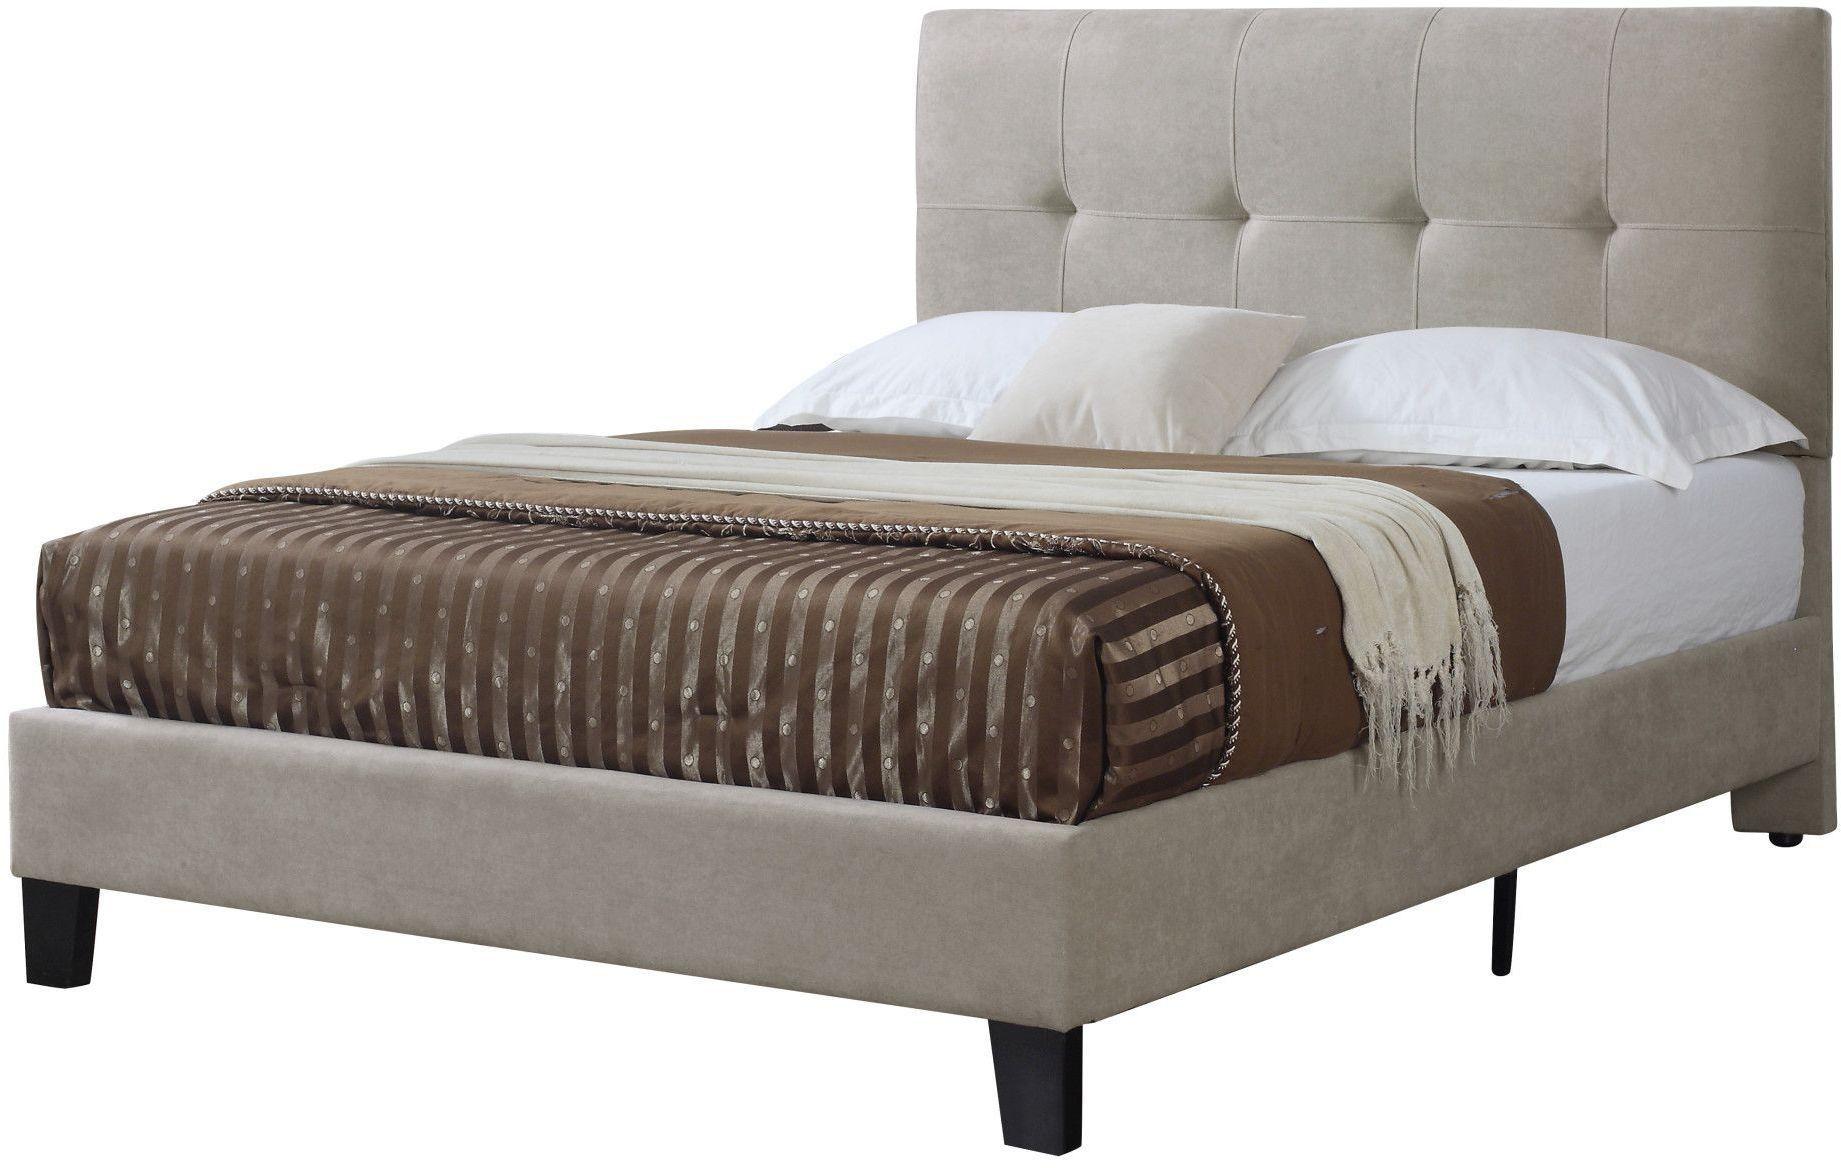 Harper Taupe Cal King Upholstered Platform Bed From